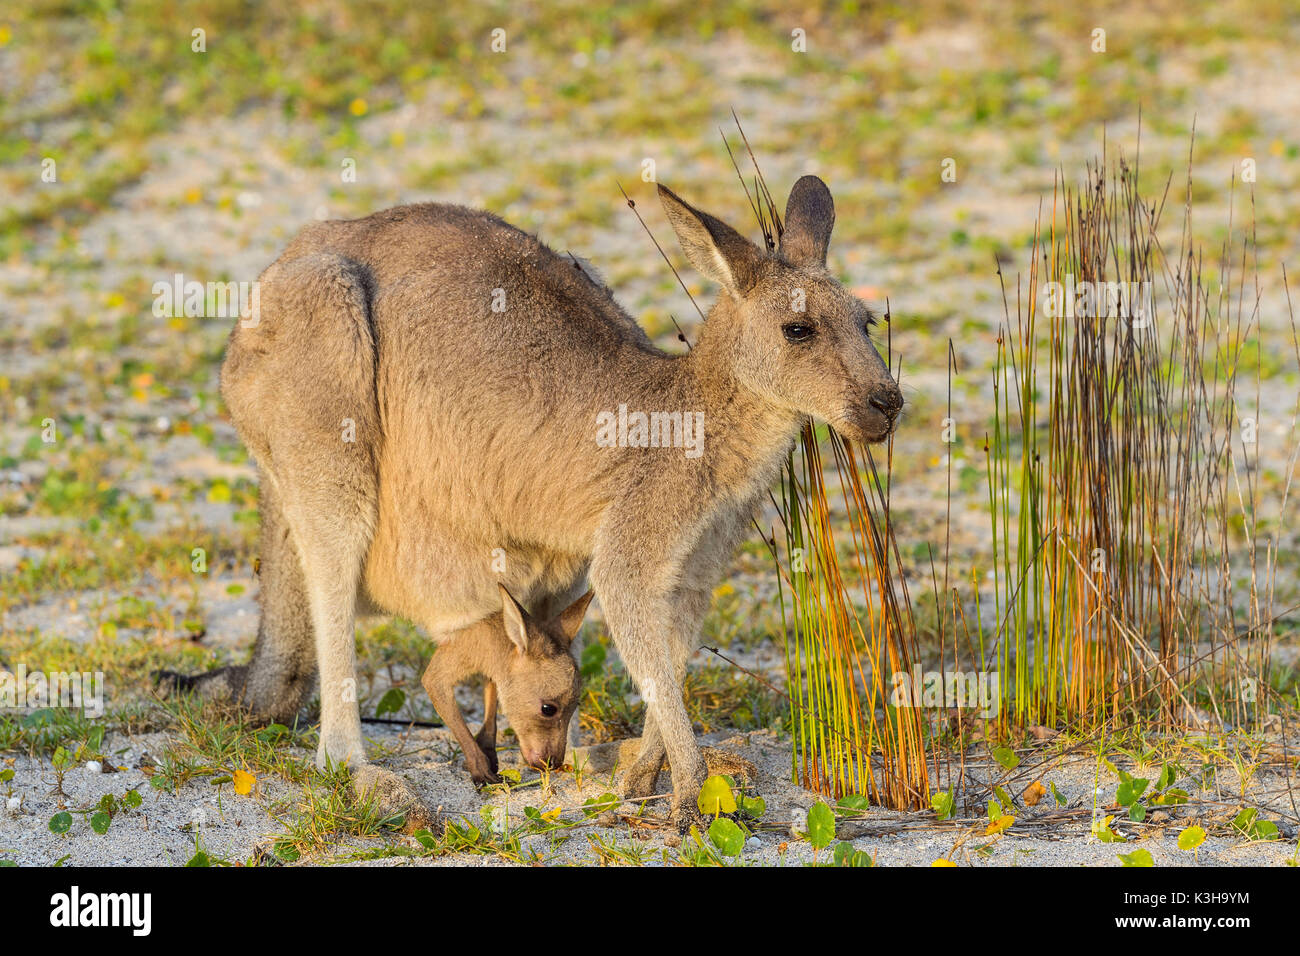 Grey Kangaroo, Macropus giganteus, Female with Joey in Pouch, Murramarang National Park, New South Wales, Australia - Stock Image